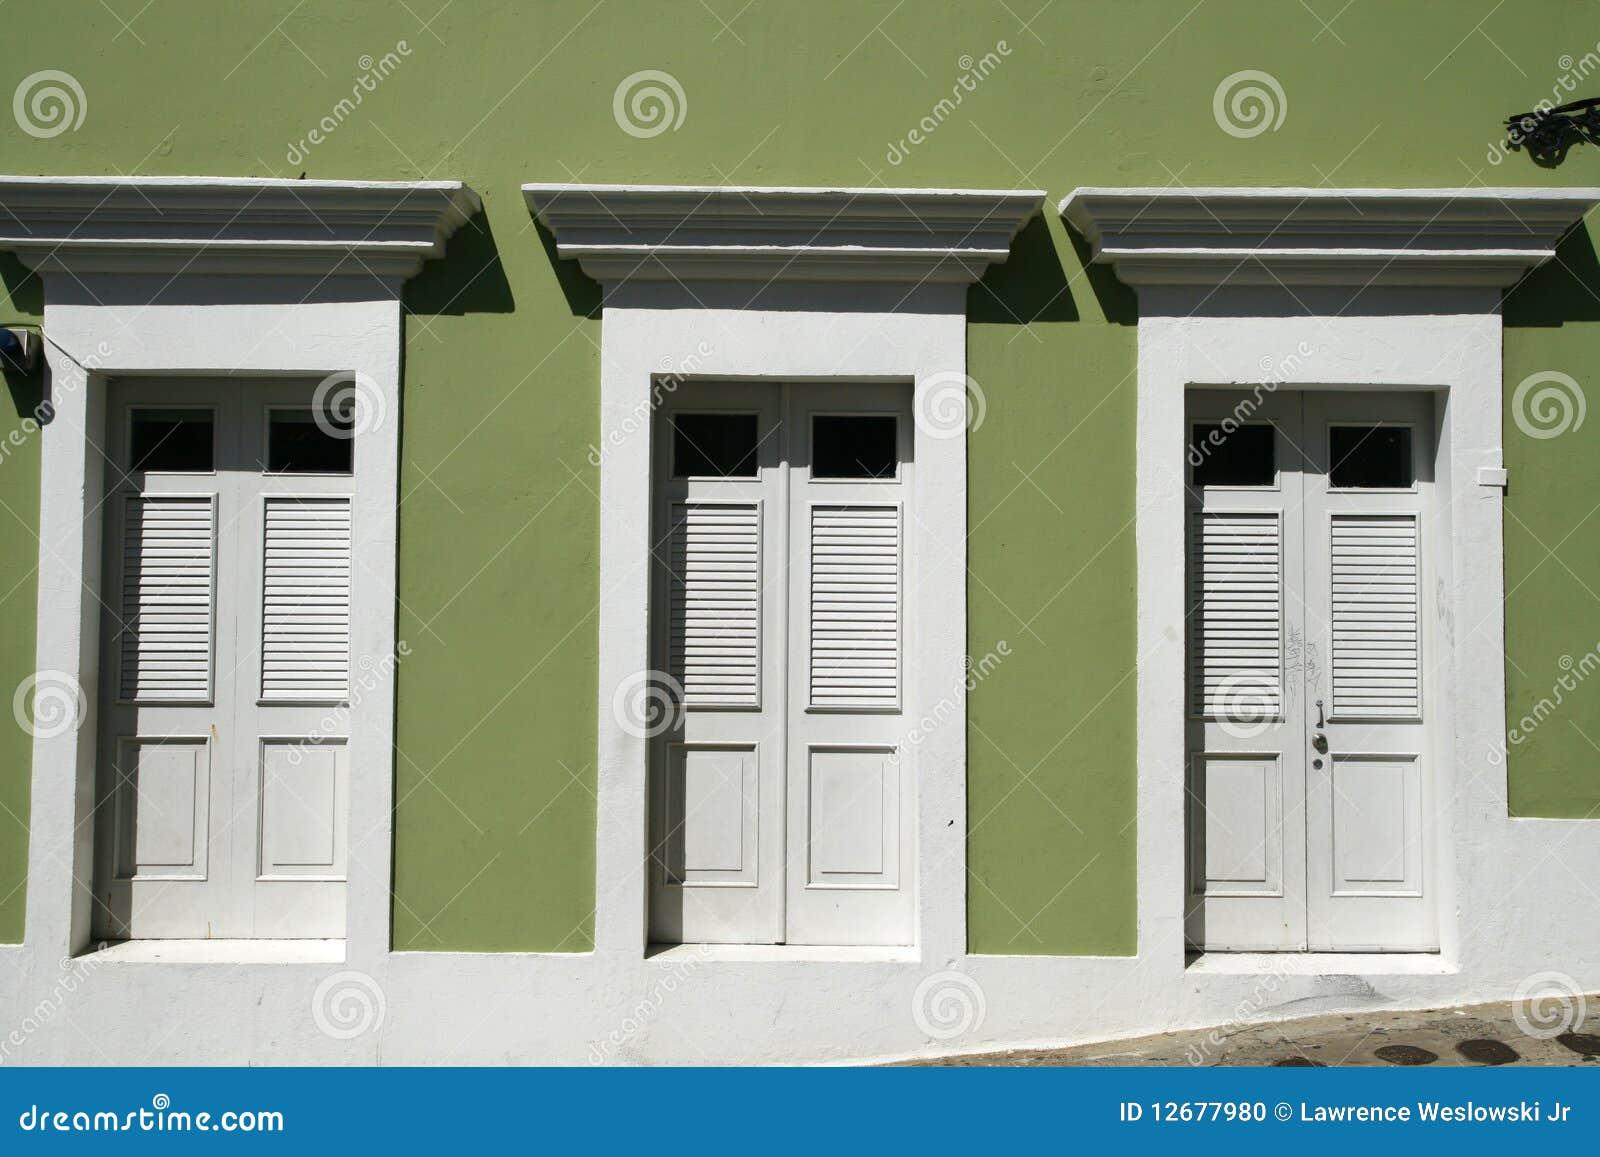 San Juan - 3 puertas en San Juan viejo